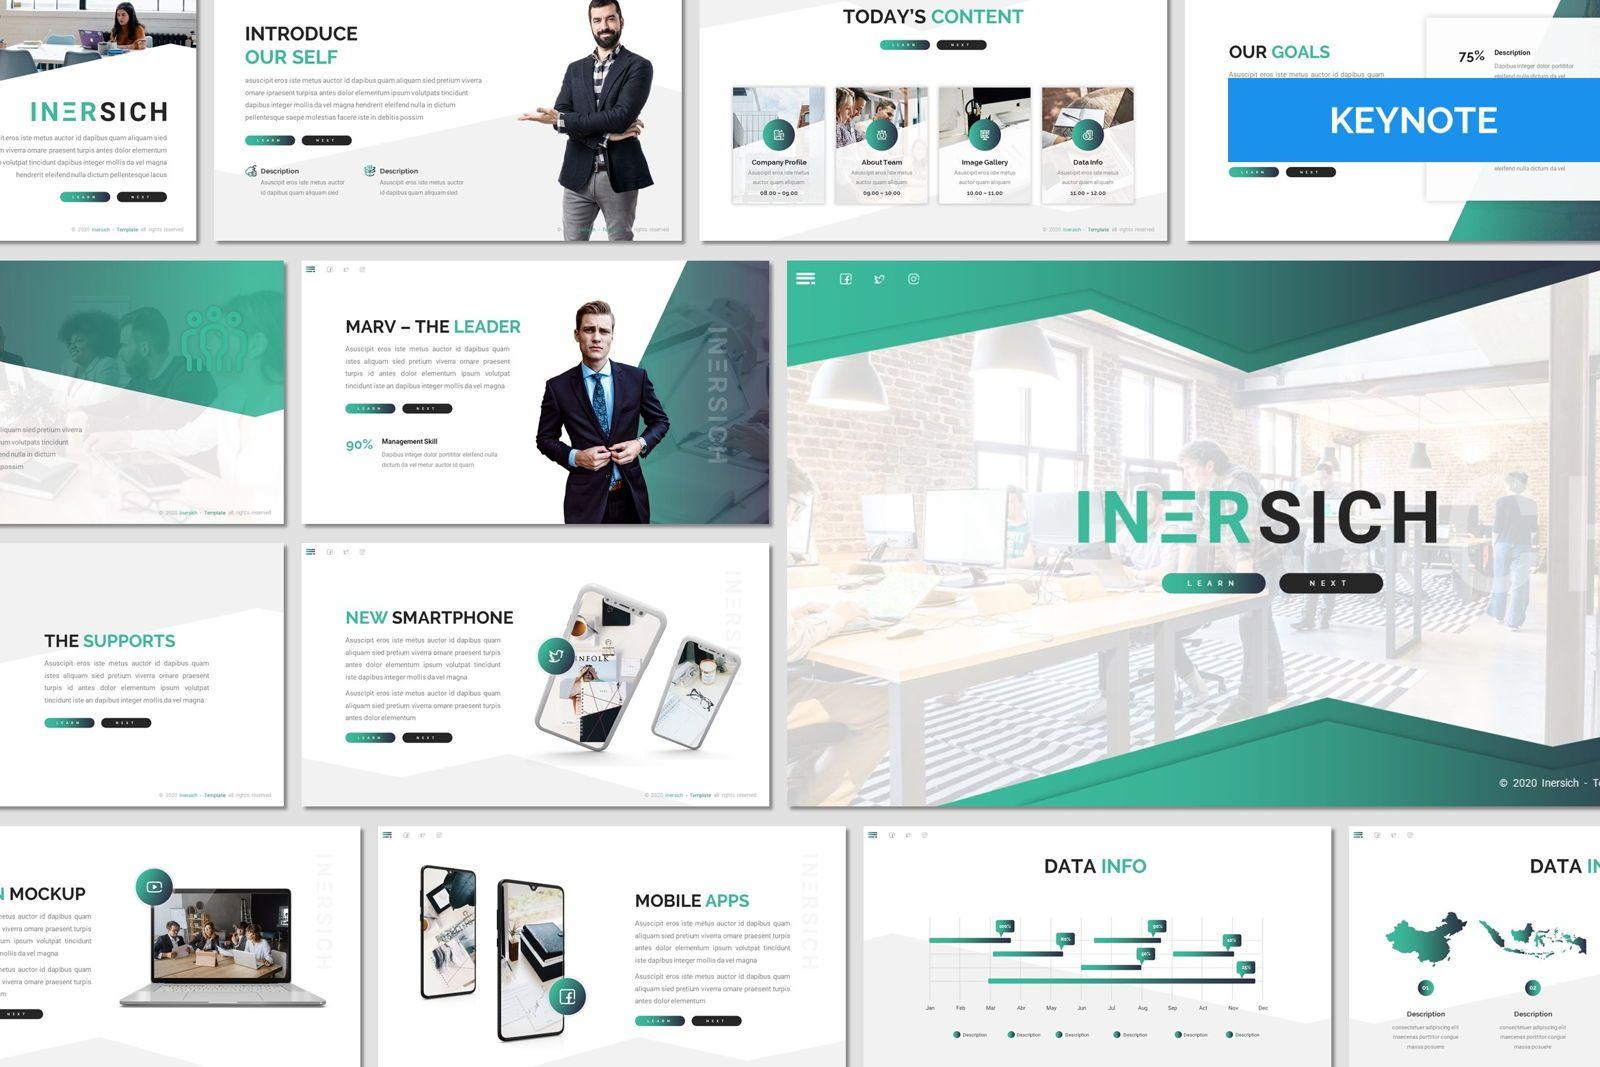 Inersich - Keynote Template, 08055, Presentation Templates — PoweredTemplate.com